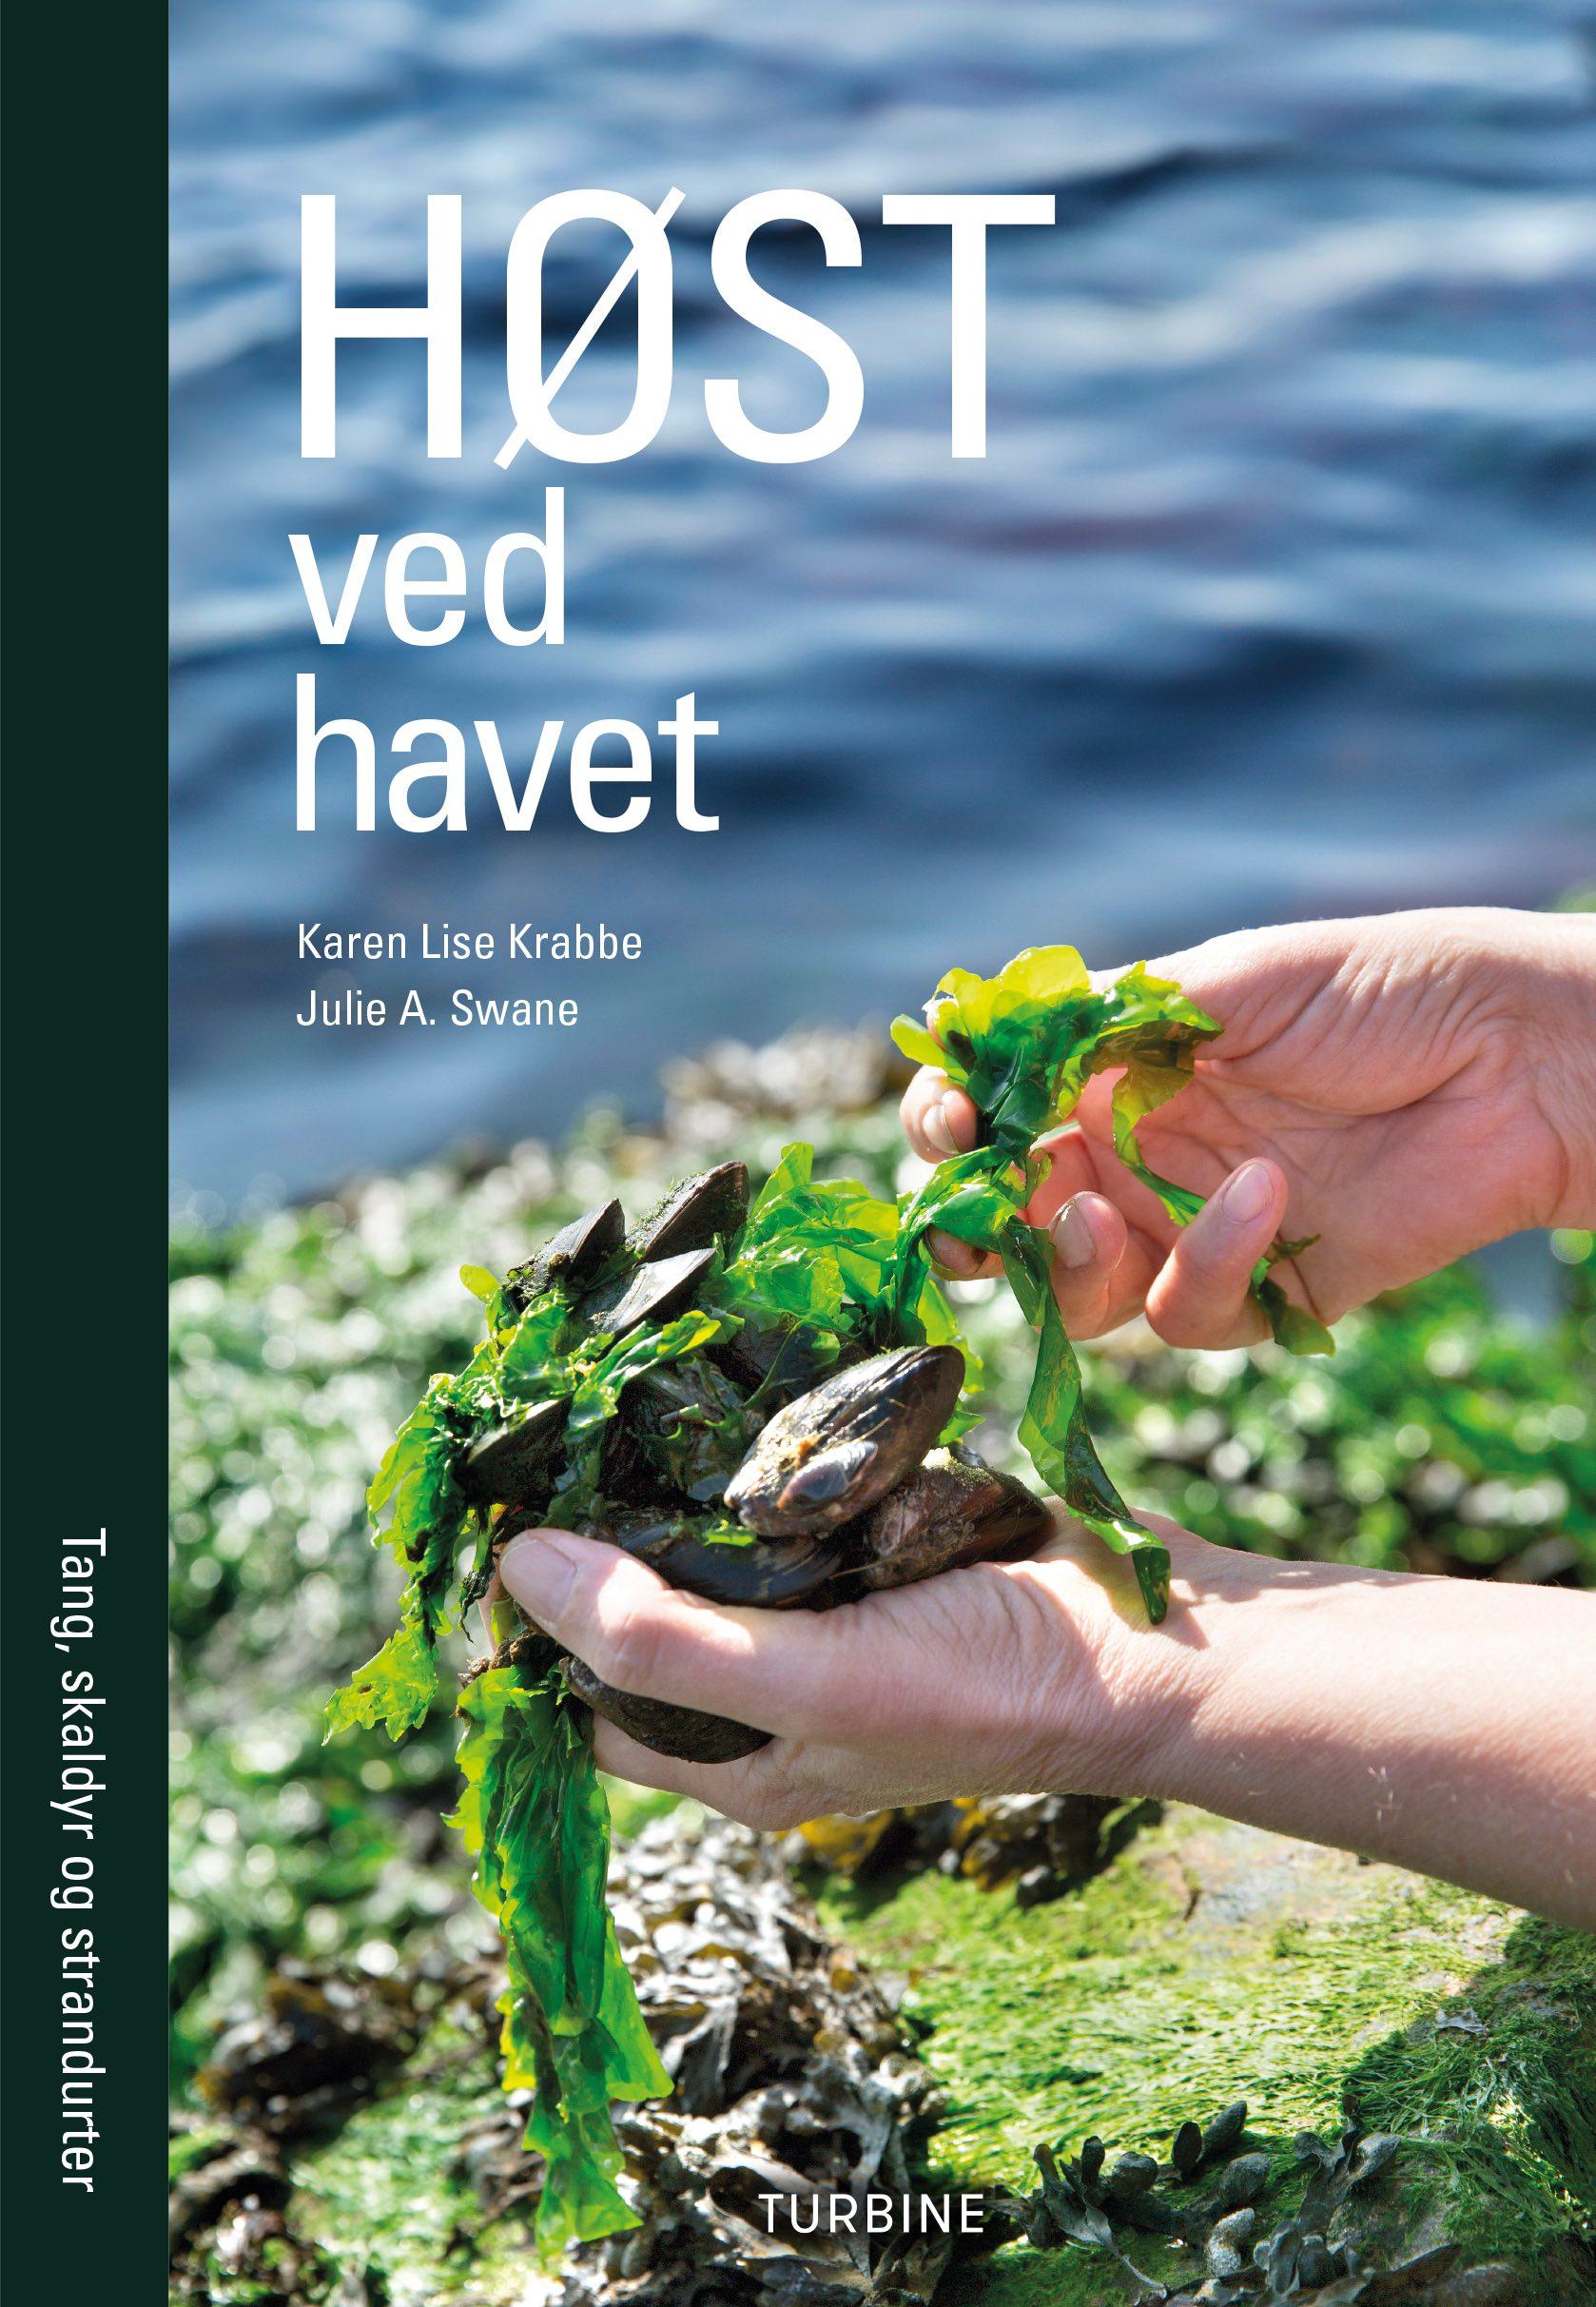 Høst ved havet - Karen Lise Krabbe og Julie Anette Swane - Bøger - Turbine - 9788740656794 - September 18, 2019